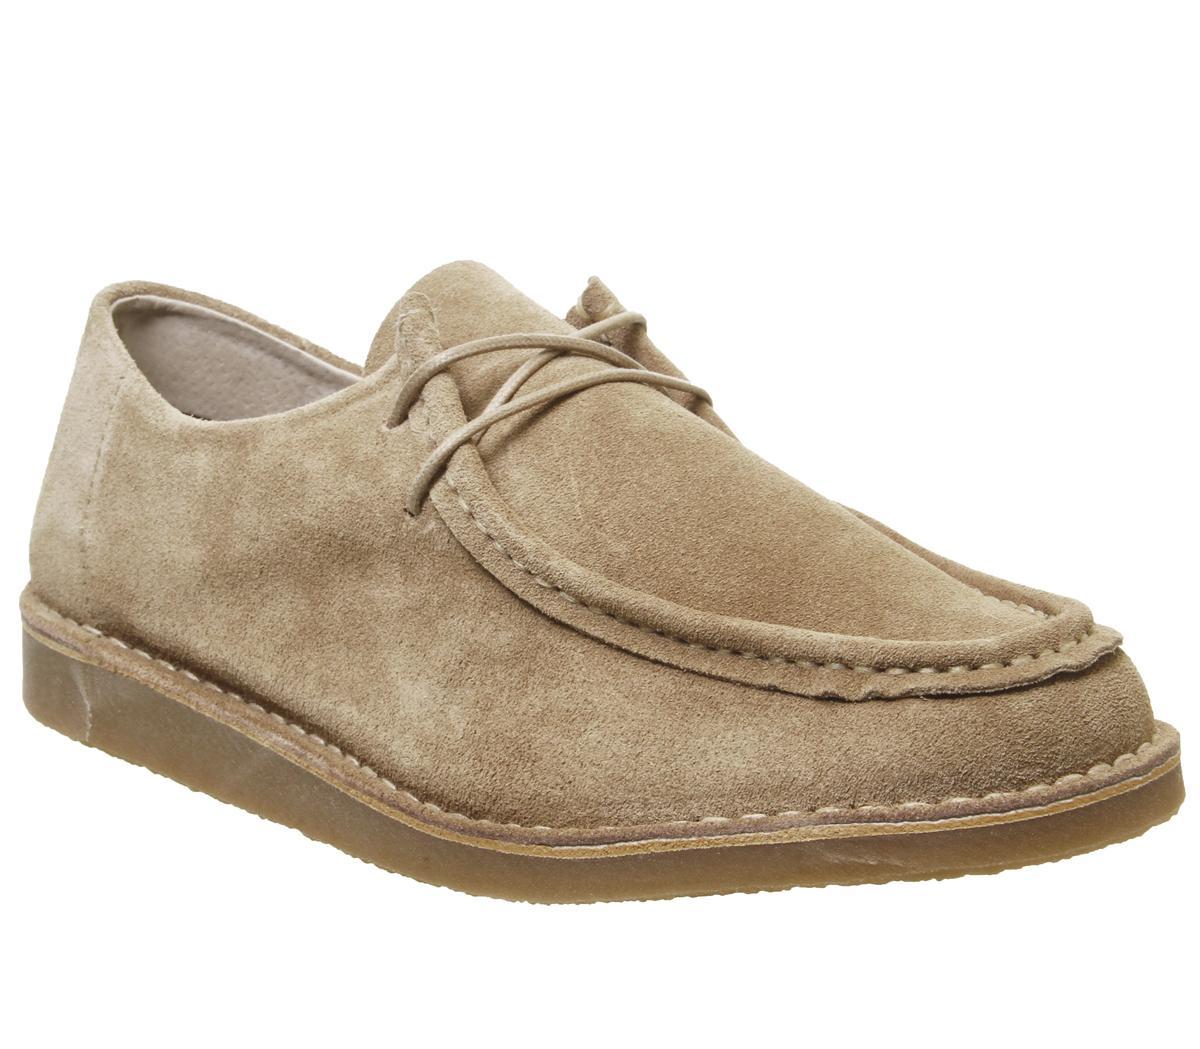 Cain Apron Toe Shoes